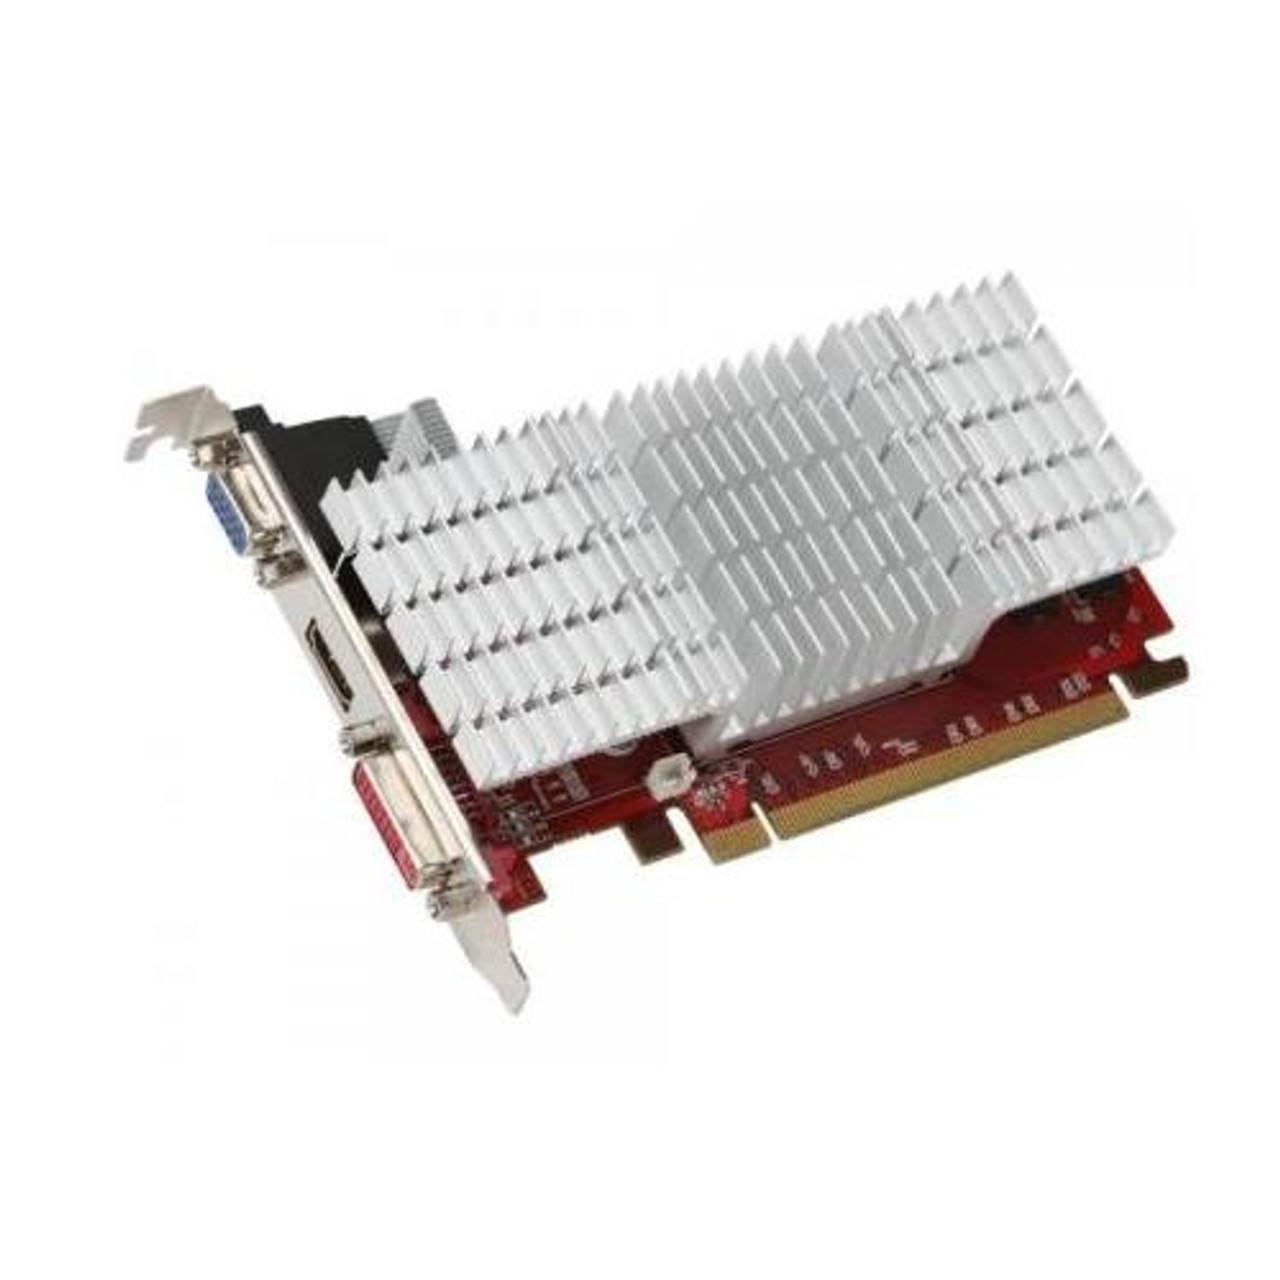 R4350-MD512H/D3 MSI ATI Radeon HD 4350 512MB DDR3 64-Bit DVI/HDMI PCI  Express 2 0 x16 Video Graphics Card